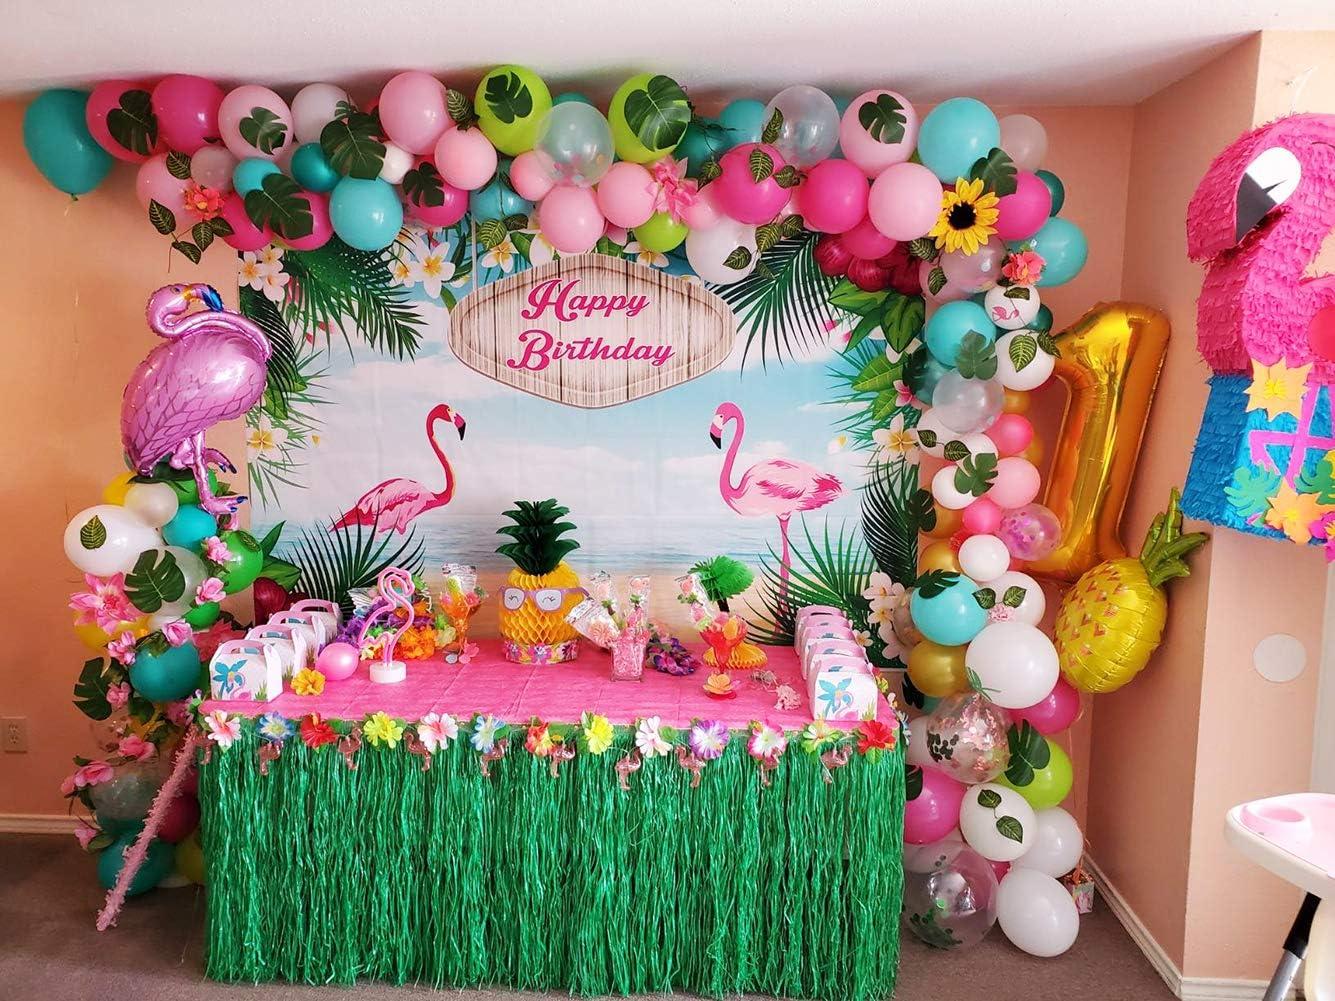 Hawaii Flamingo Tropical Themed Balloons Garland Kit Luau Balloon Arch Garland for Birthday Party Baby Shower Hawaii Luau Summer Beach Party Supplies 70PCS DIY Balloons Garland with Blue Green Hotpink Confetti Balloons